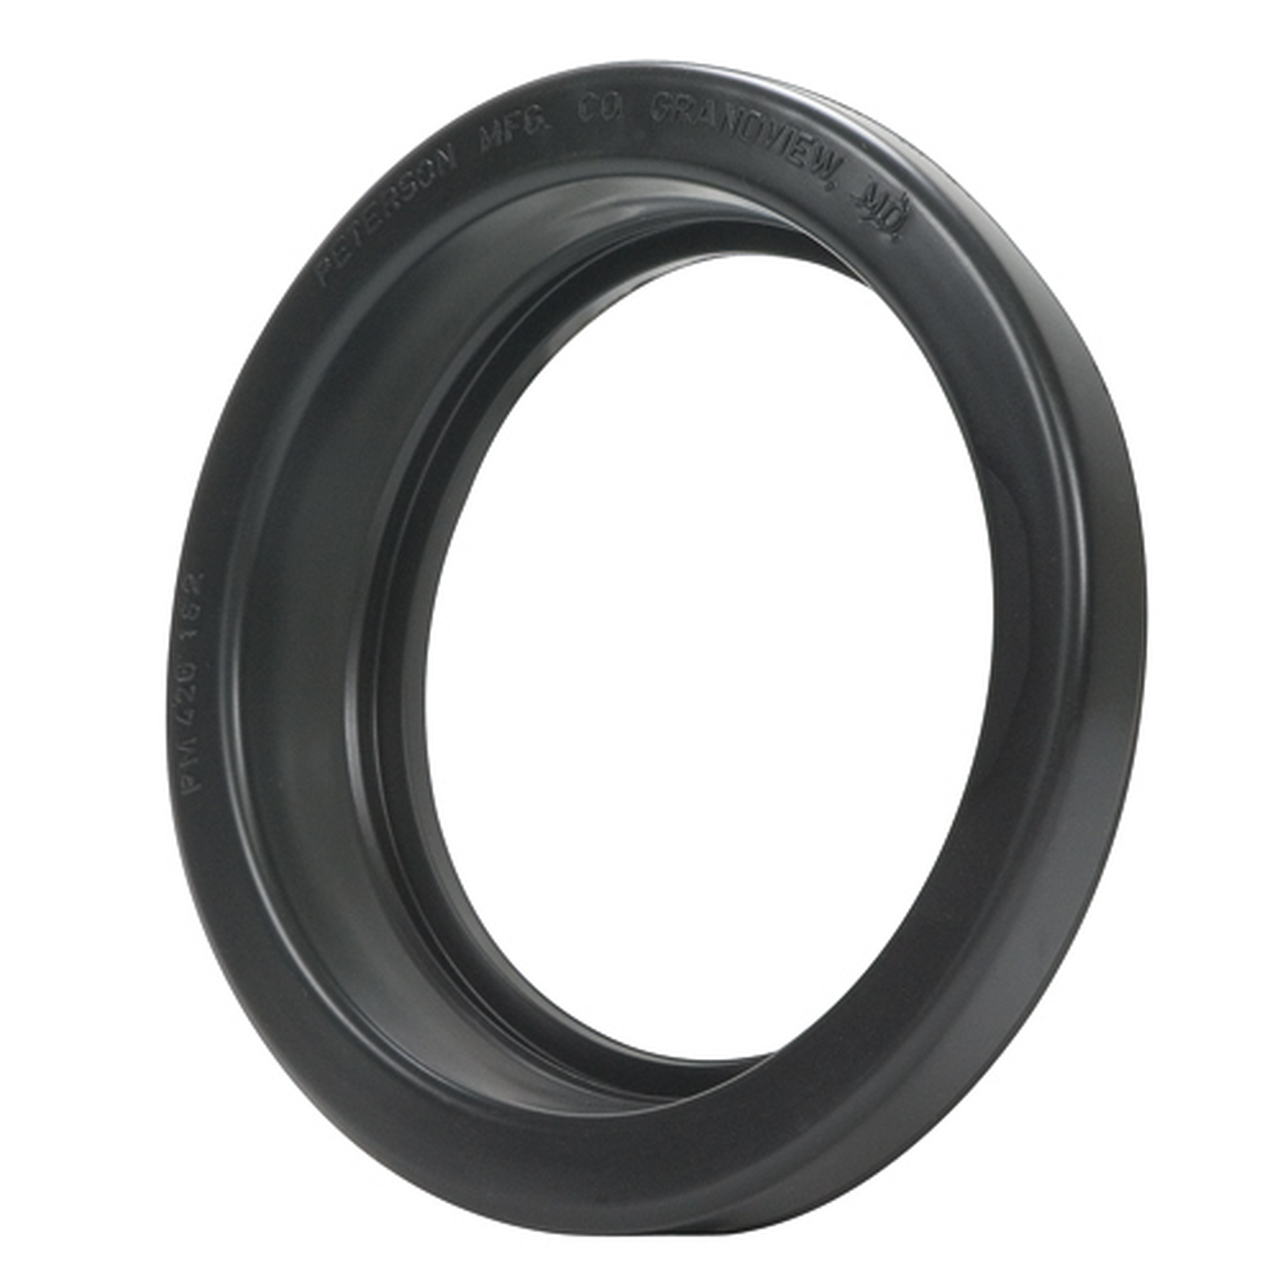 Rubber Grommet. Part Number: B426-18